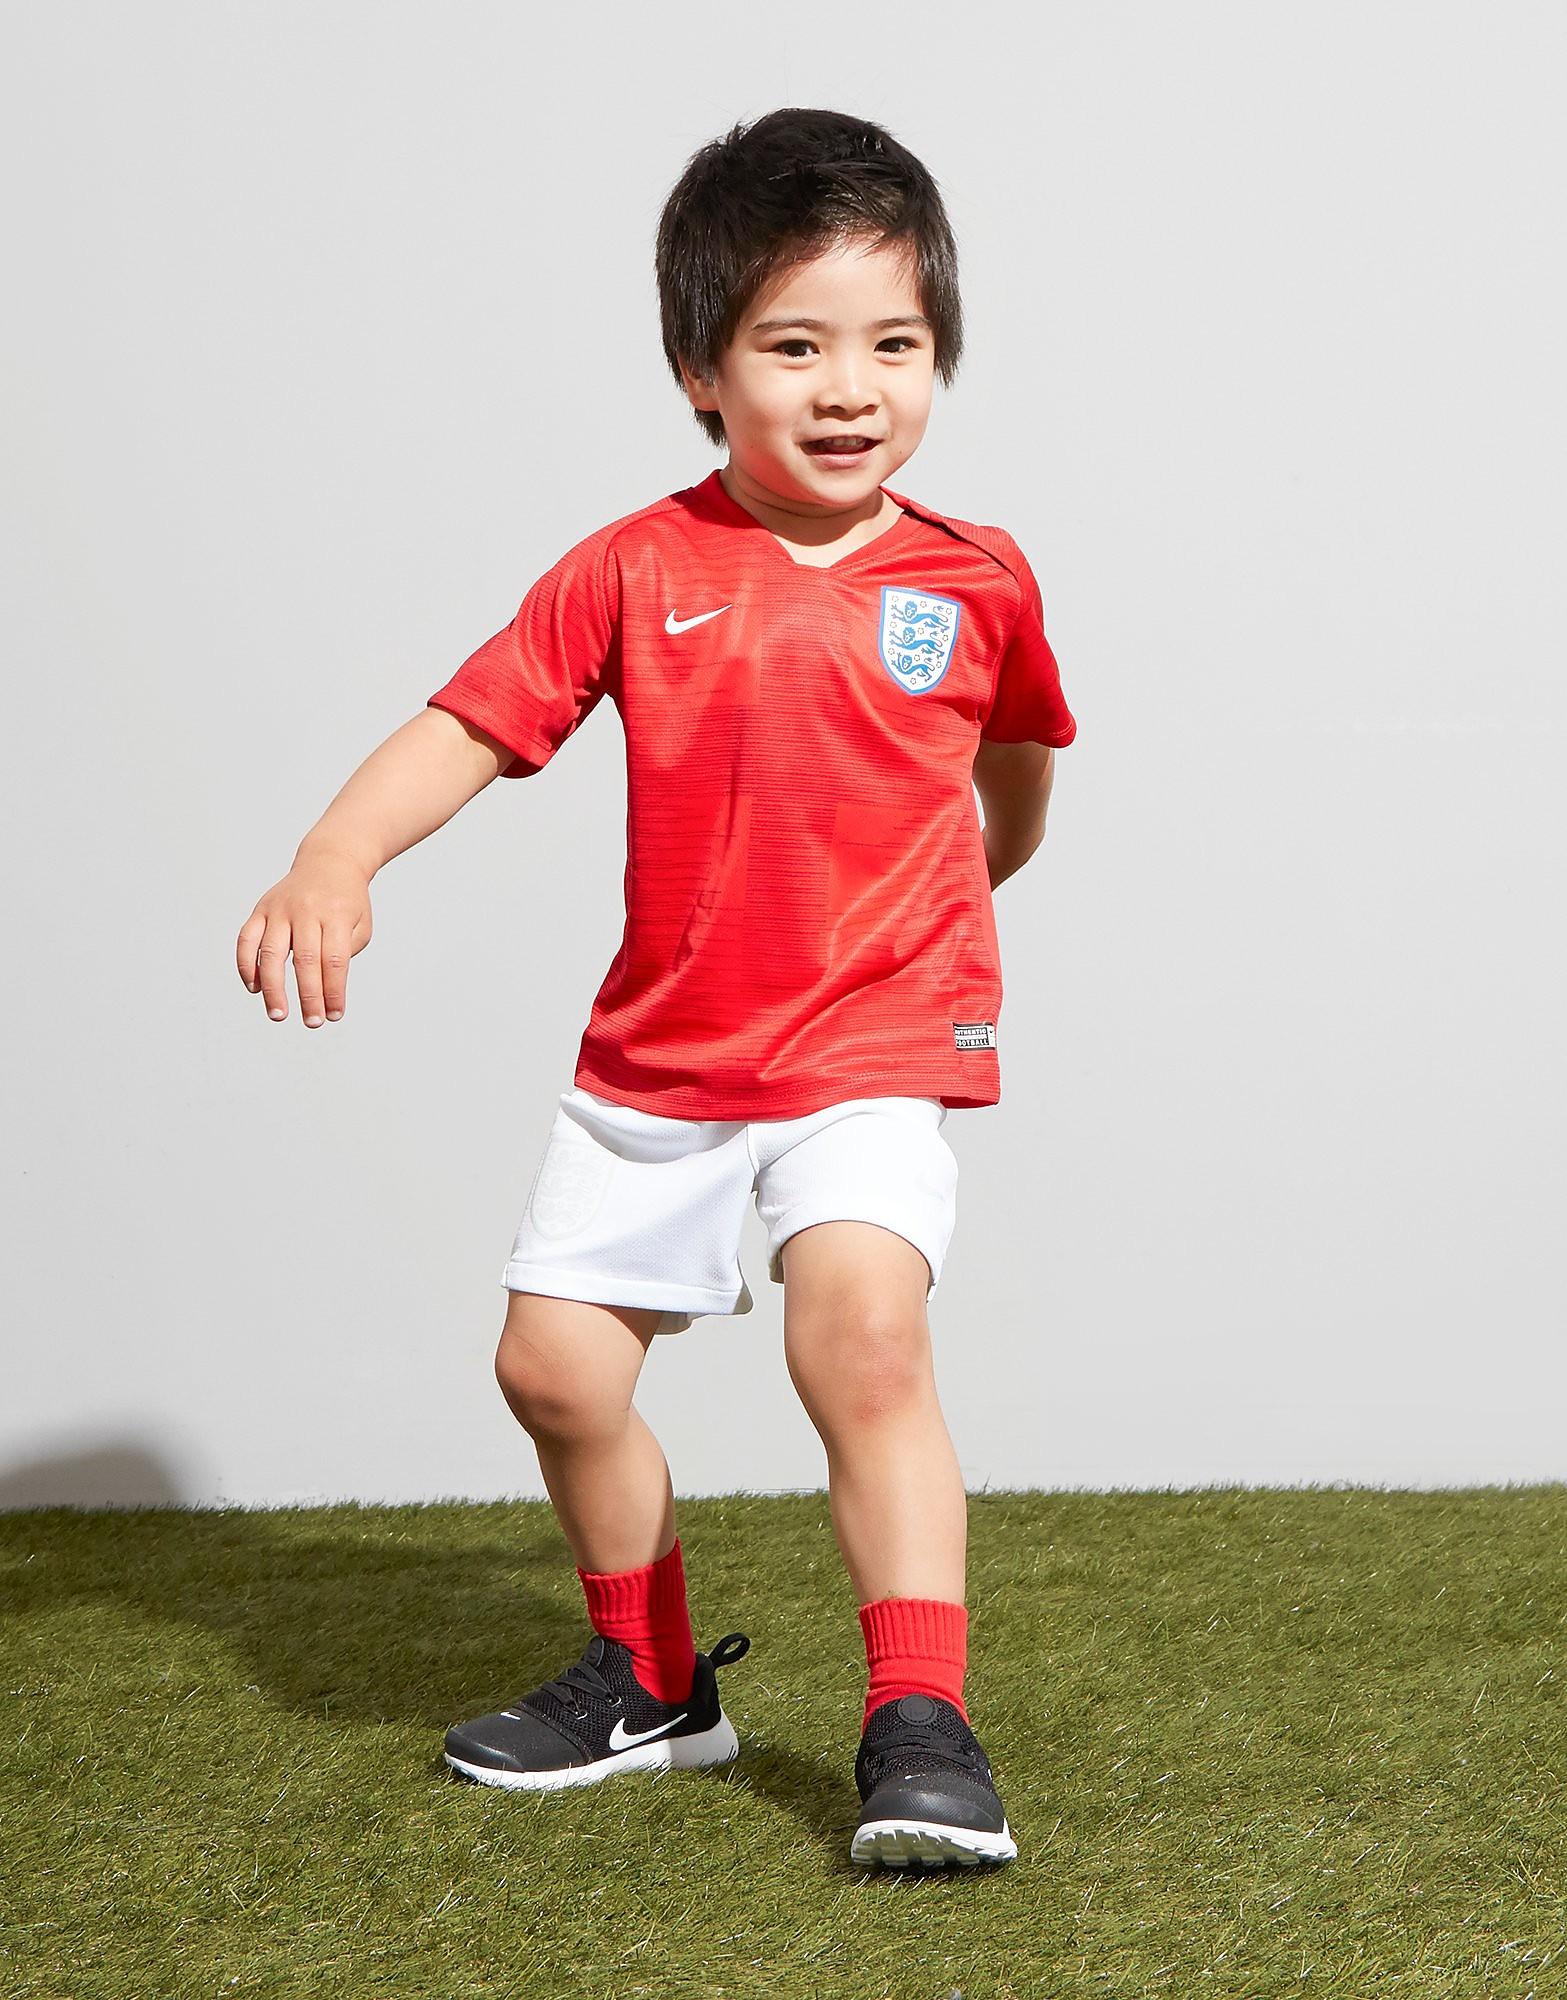 Nike Kit Extérieur Angleterre 2018 Bébé